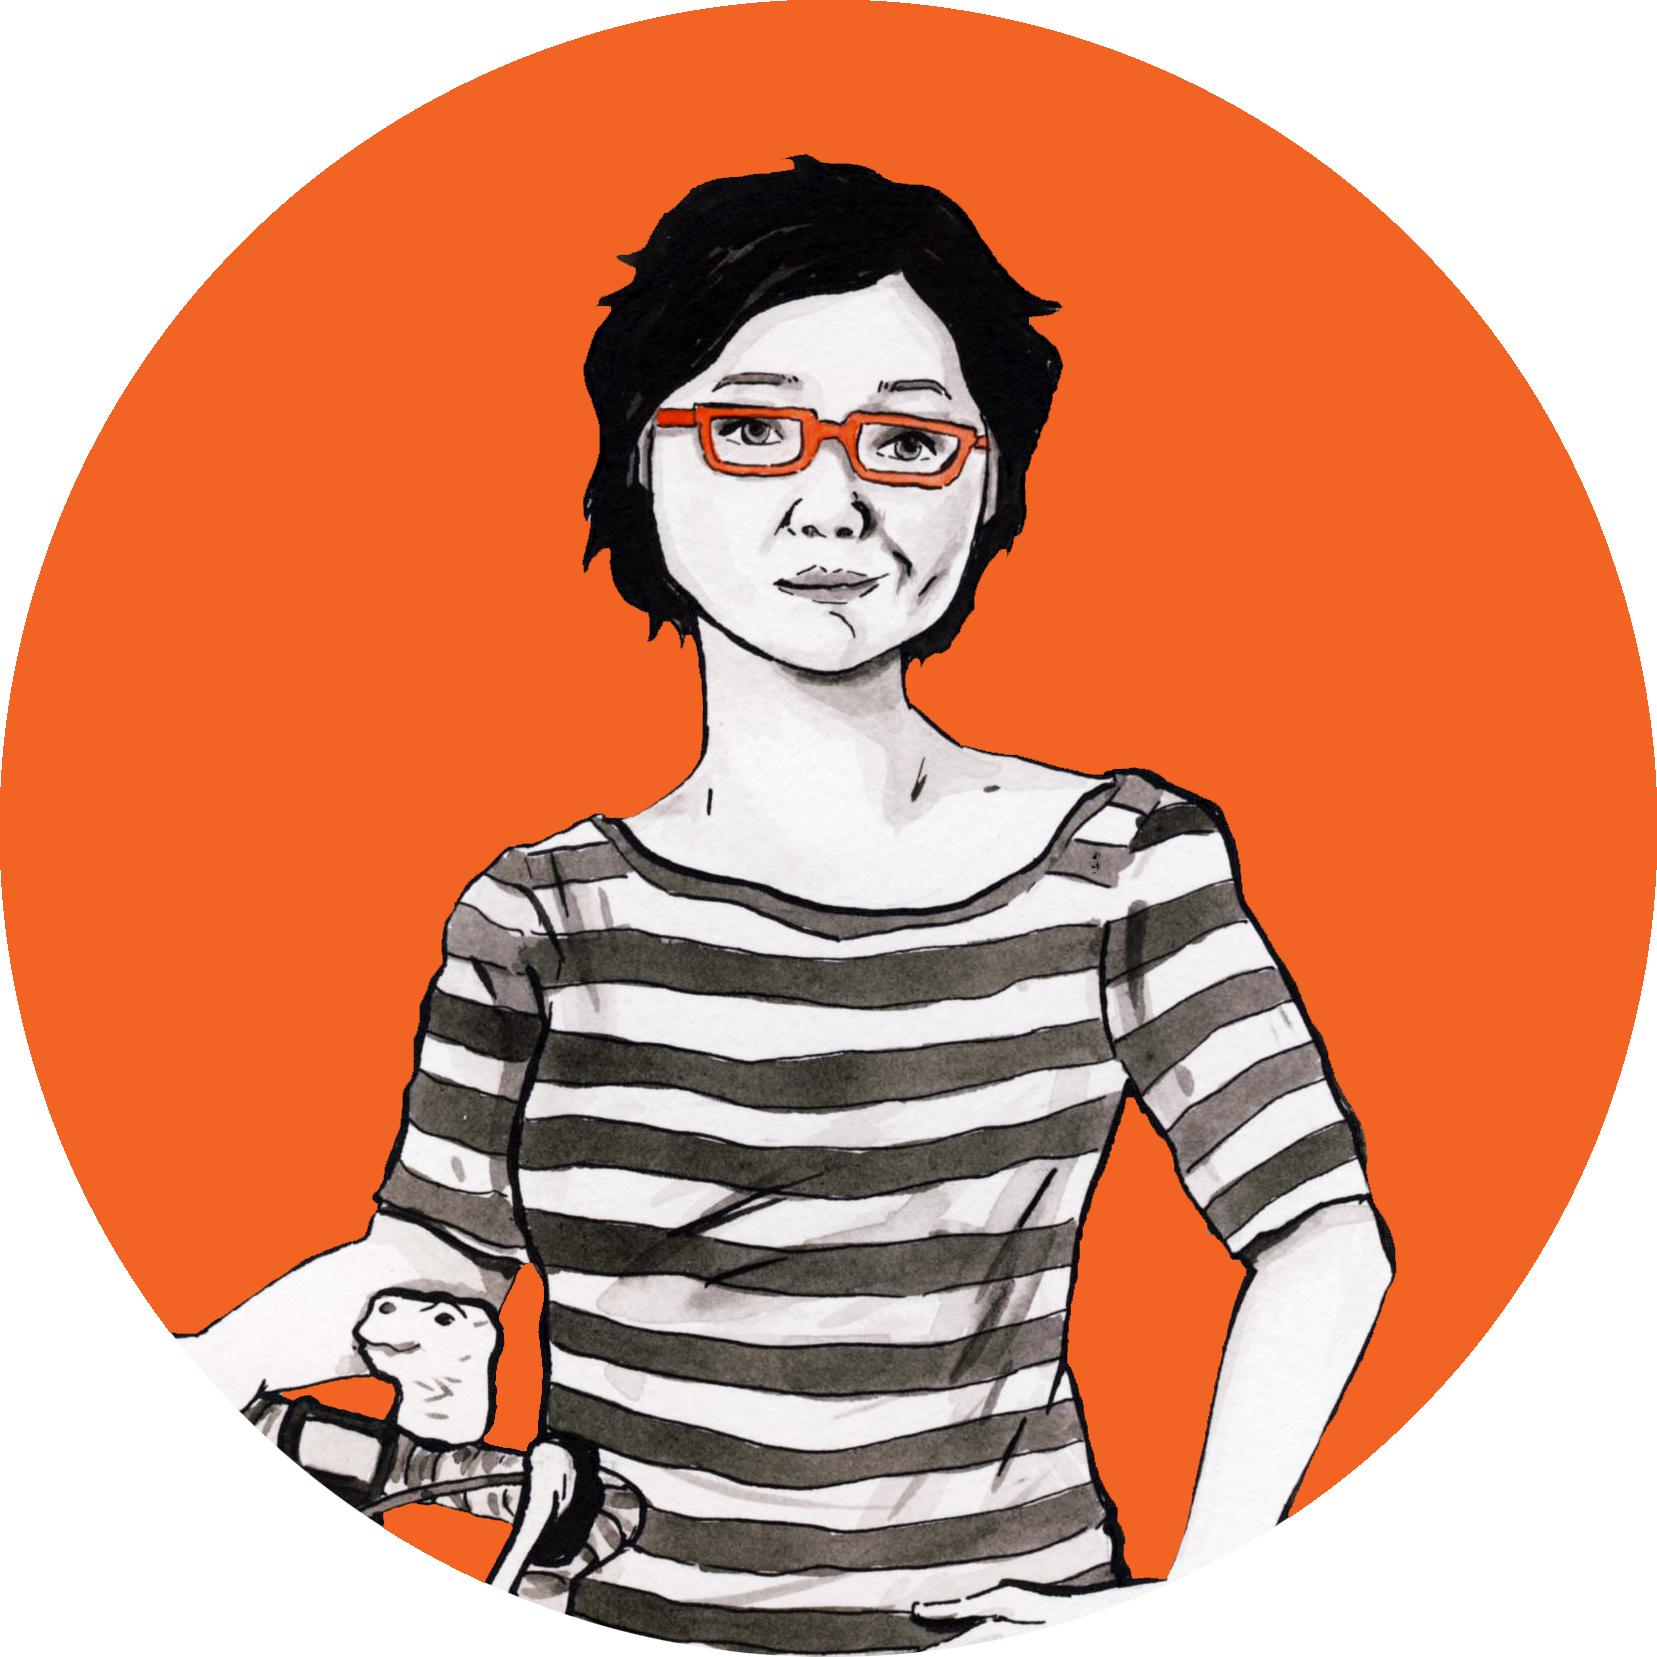 Illustration by the multi-talented woman herself, Tessa Hulls.